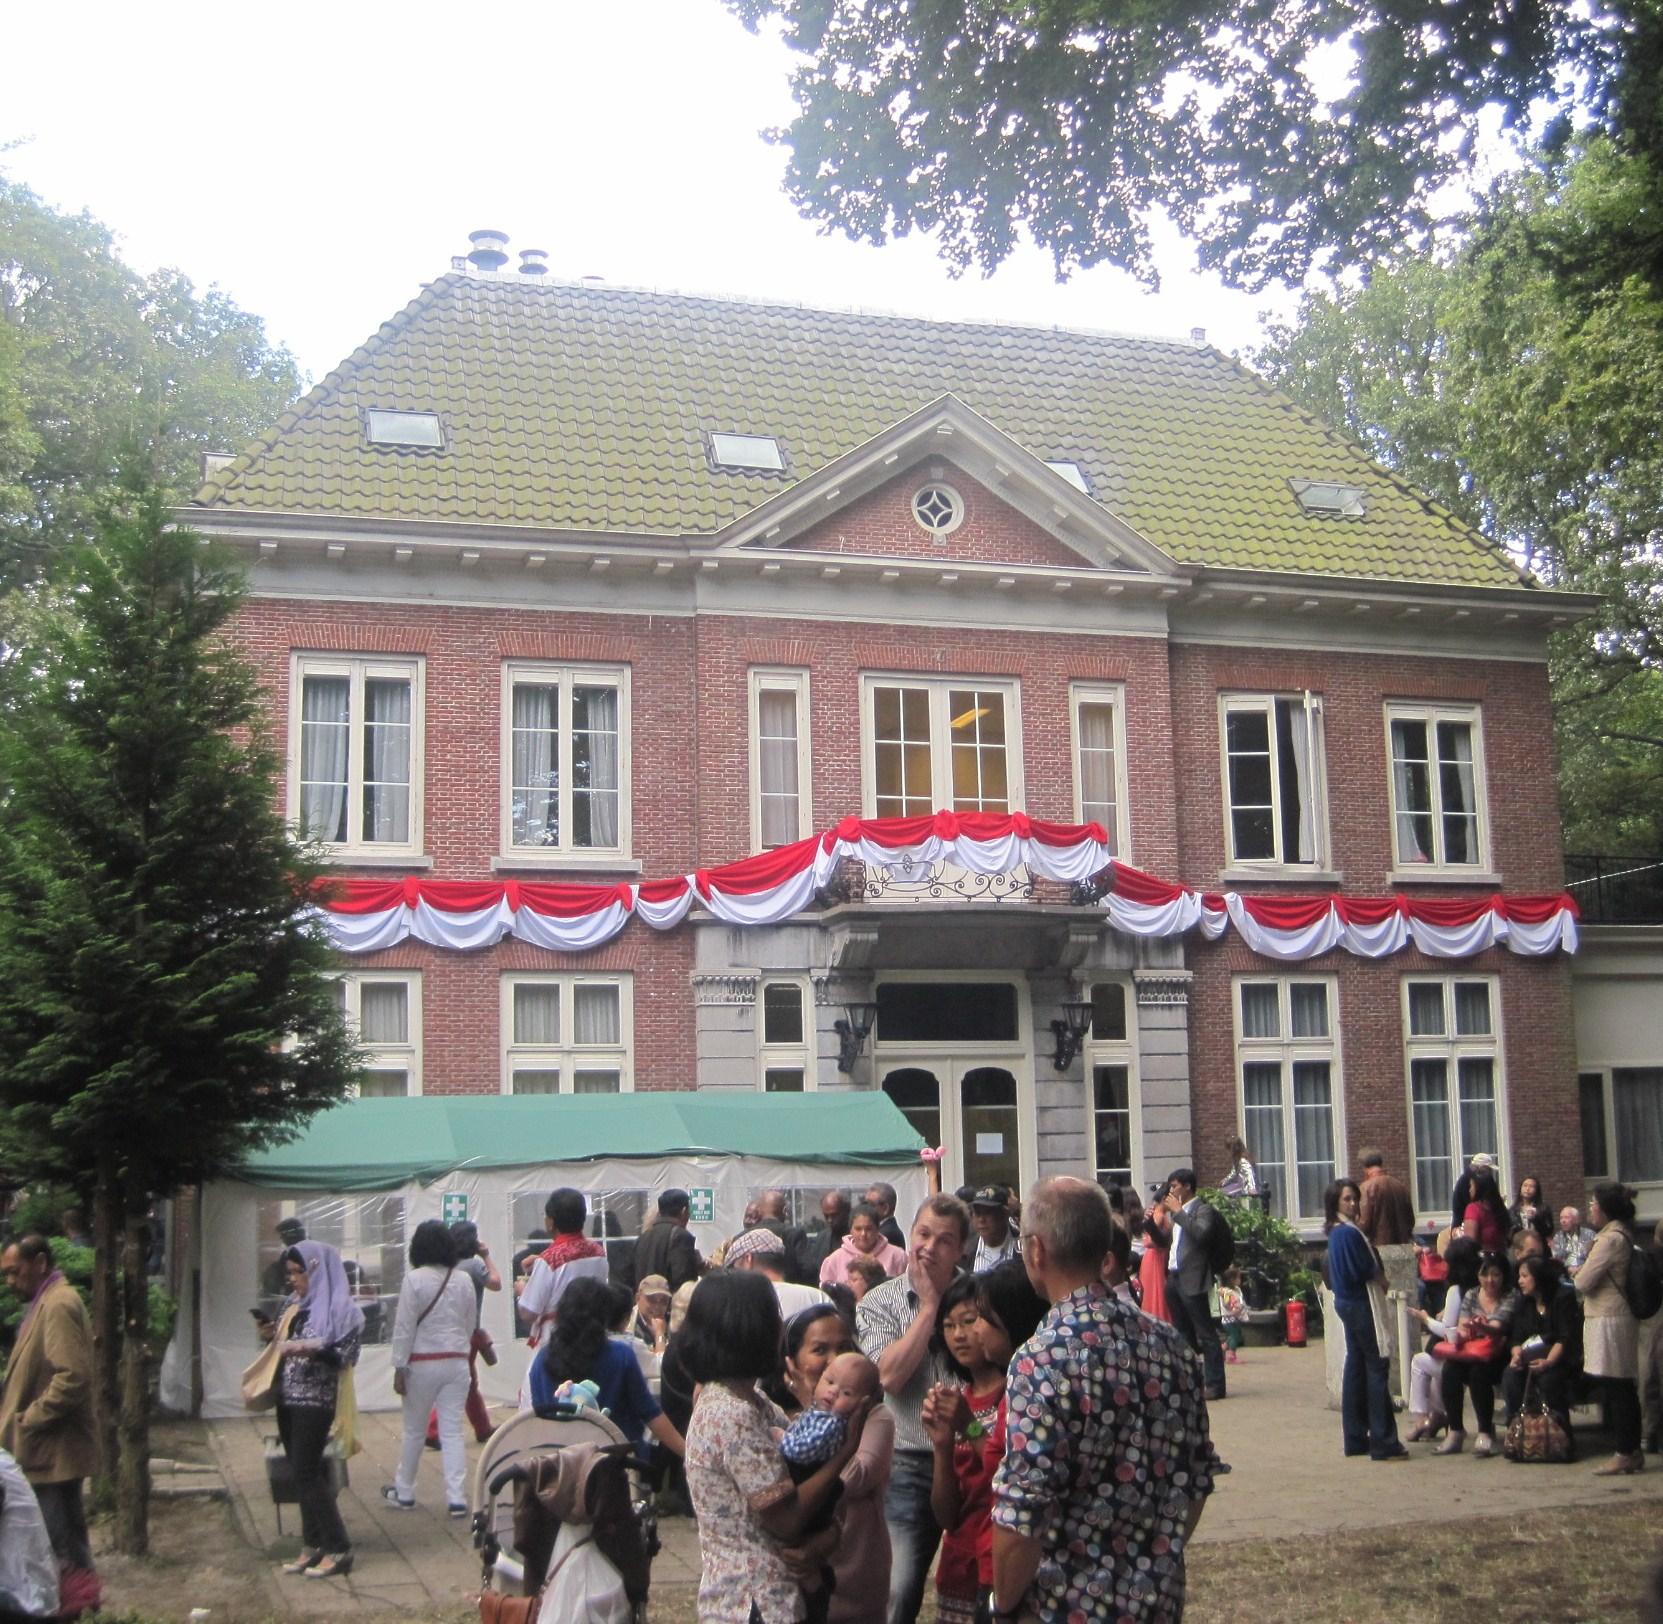 PestaRakyat2012I3-1 – Indonesische school (Sekolah Indonesia Nederland) – Foto: Charlene Vodegel / Indisch 3.0 2012